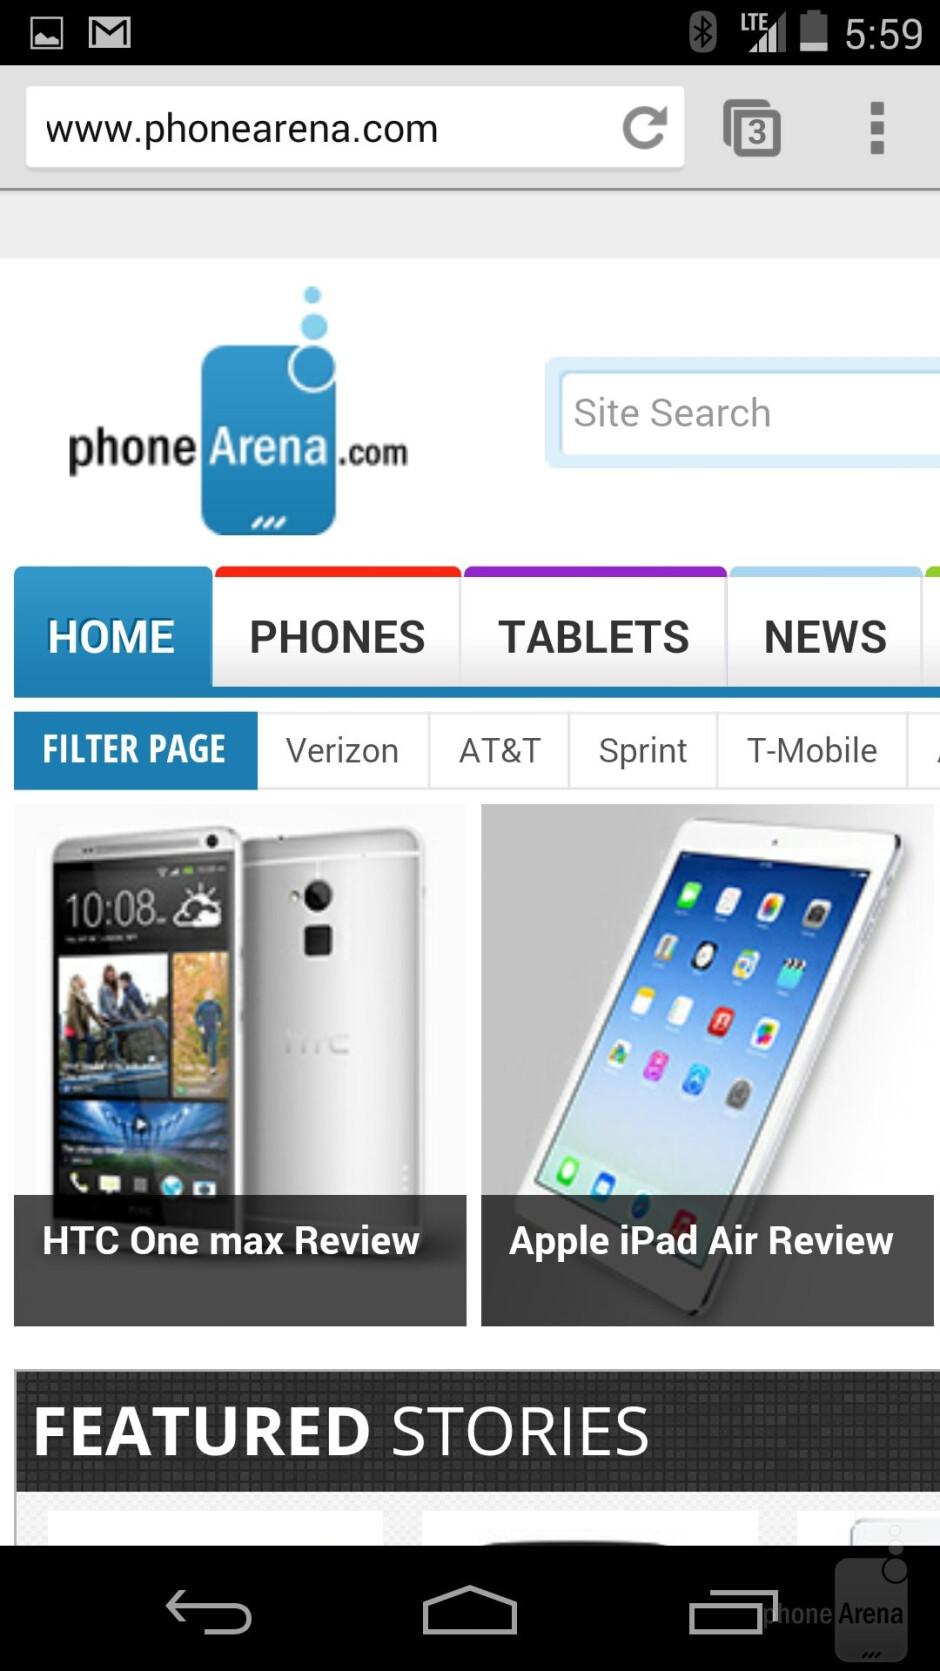 Web browser of the Google Nexus 5 - Samsung Galaxy S5 vs Google Nexus 5